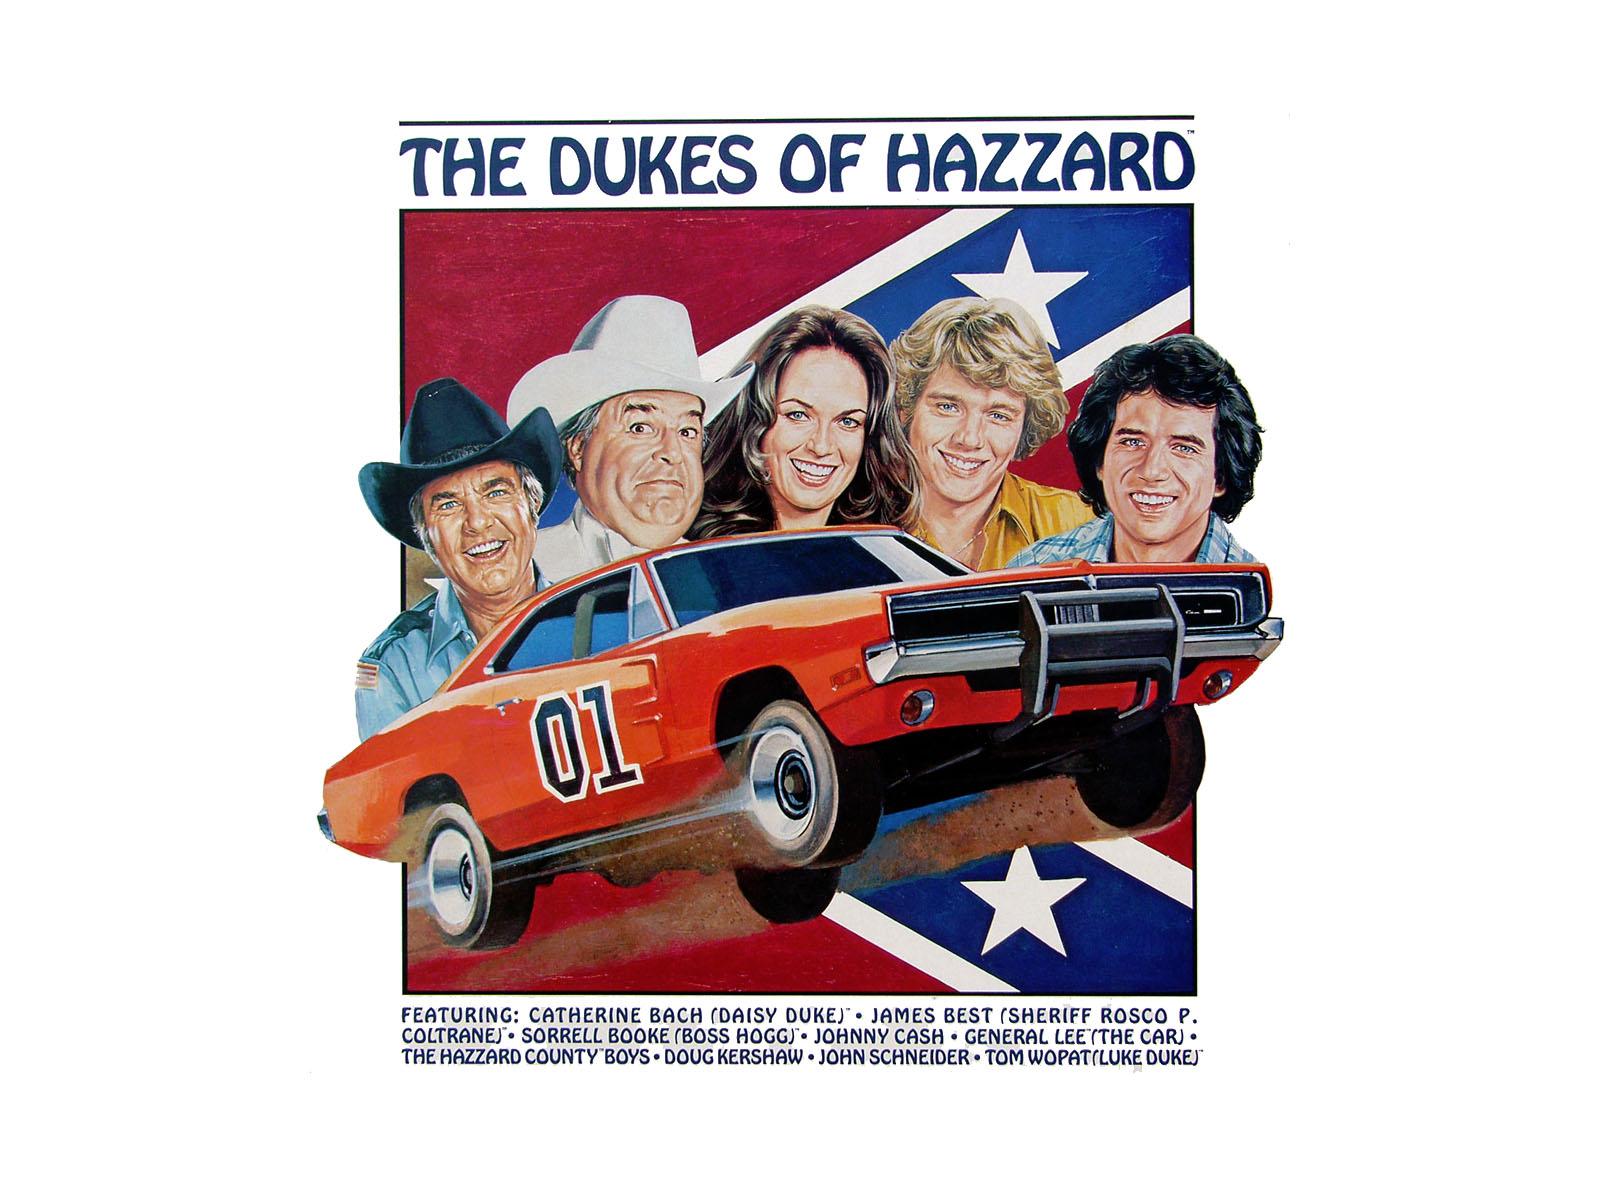 dukes of hazzard original wallpaper images pictures becuo